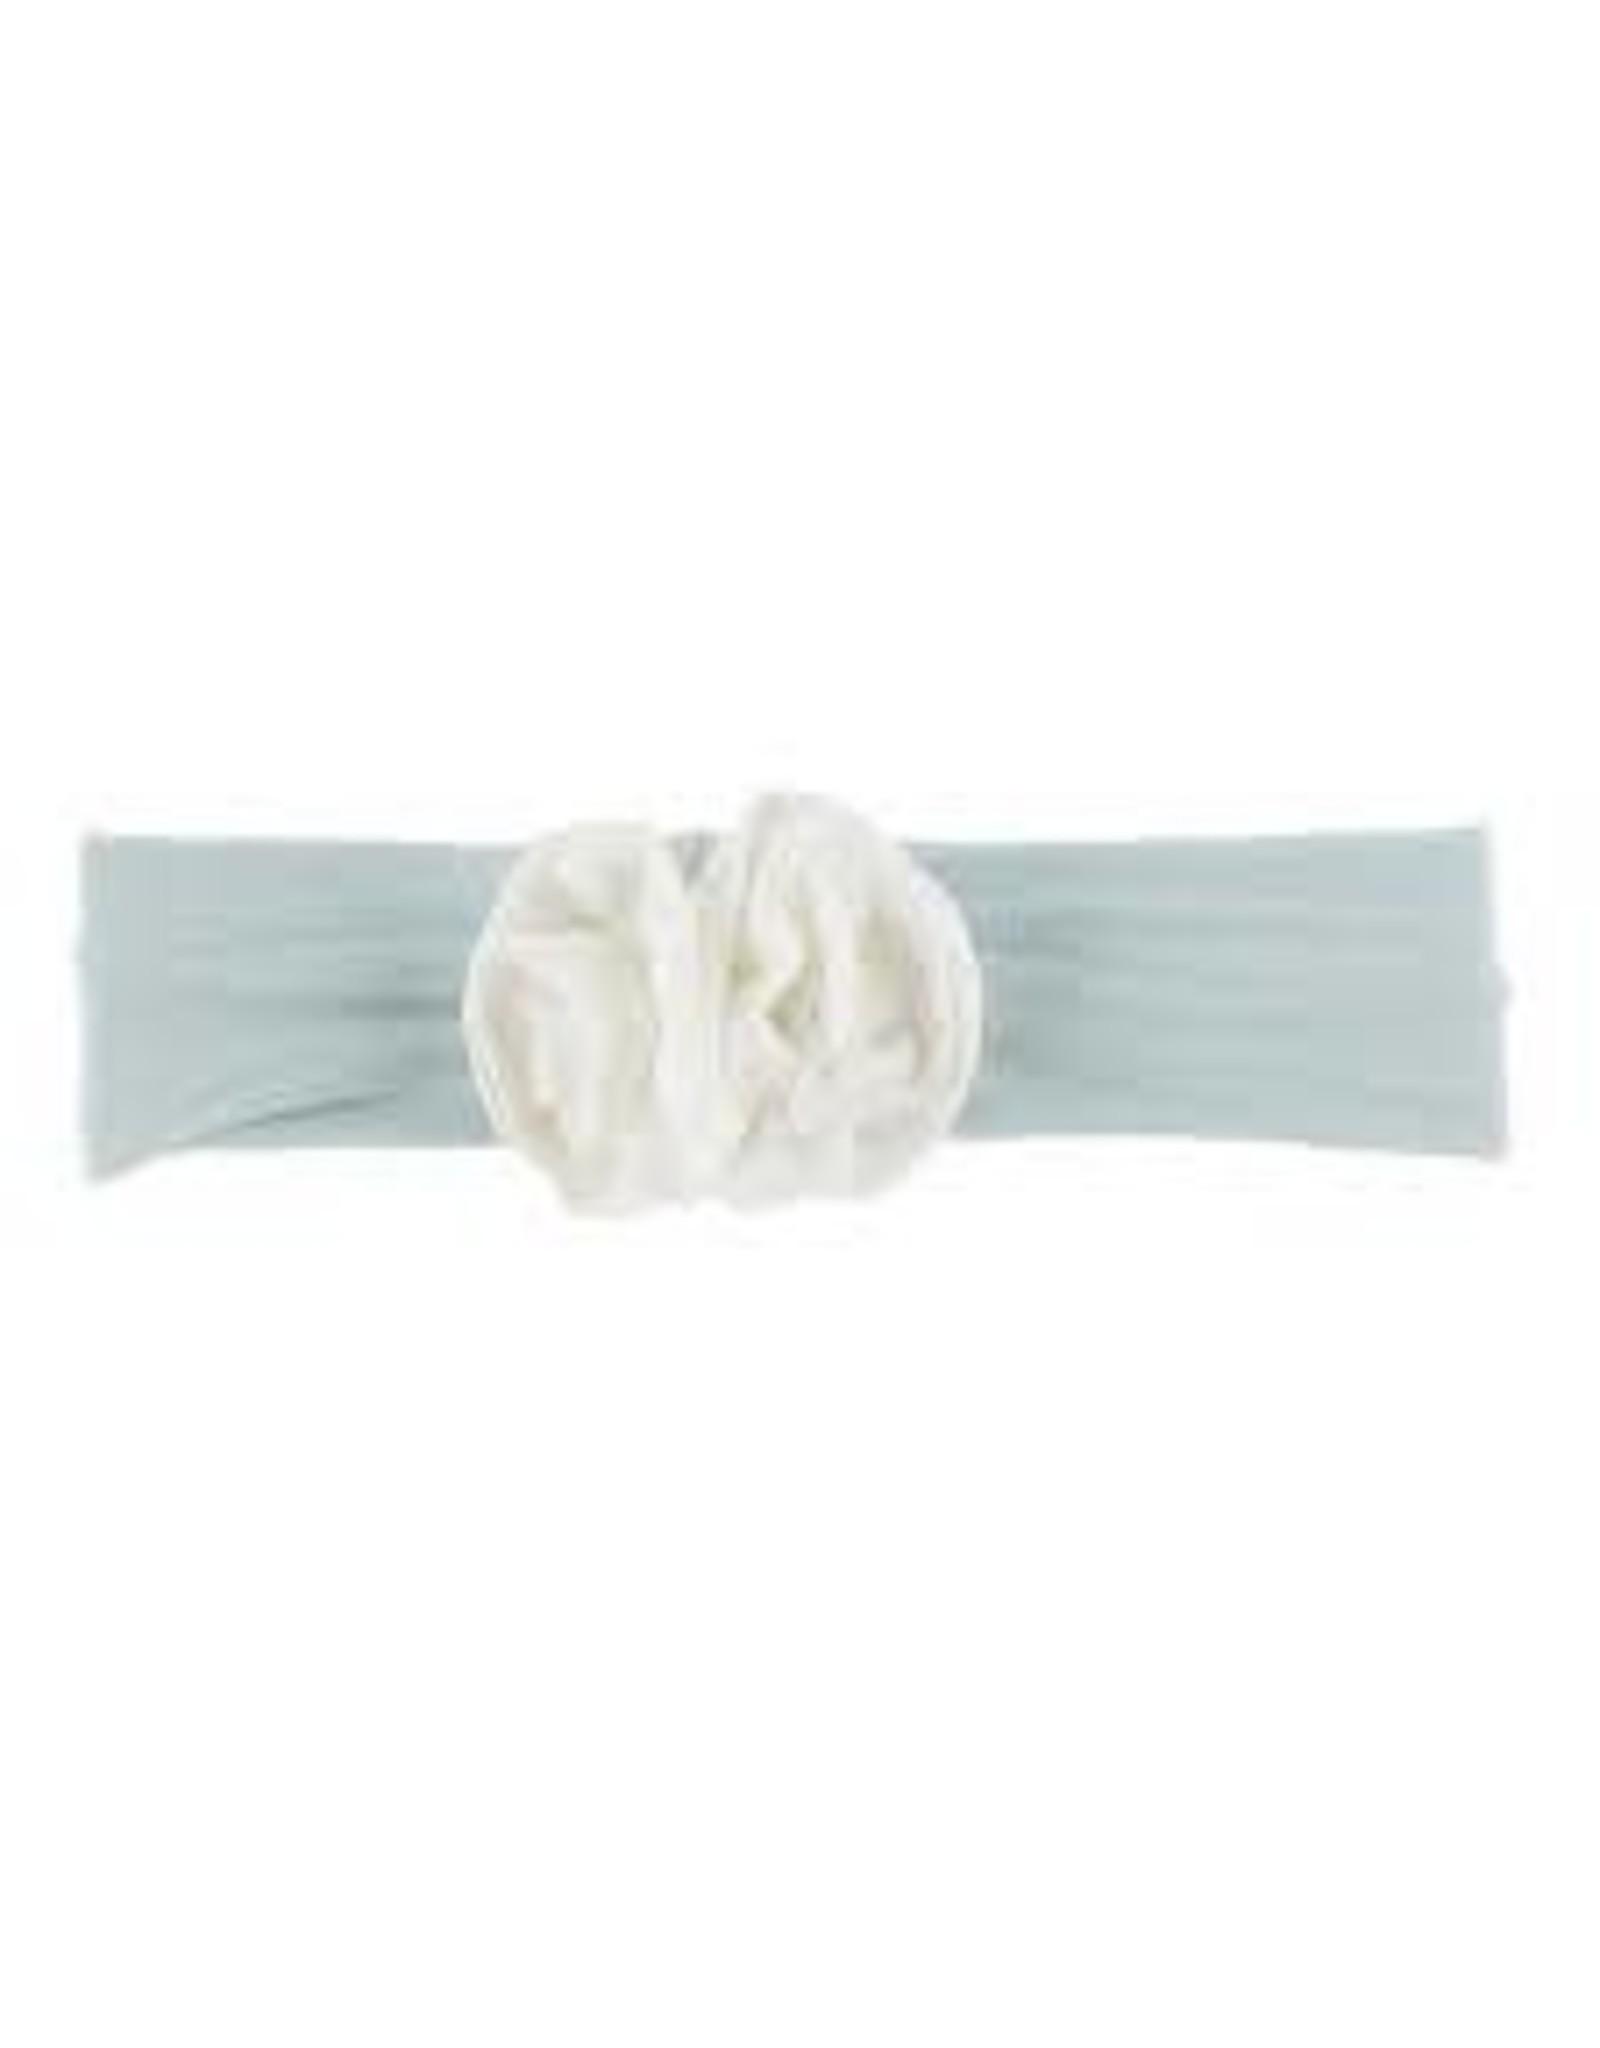 KicKee Pants Kickee Pants Solid Flower Headband, Spring Sky with Natural